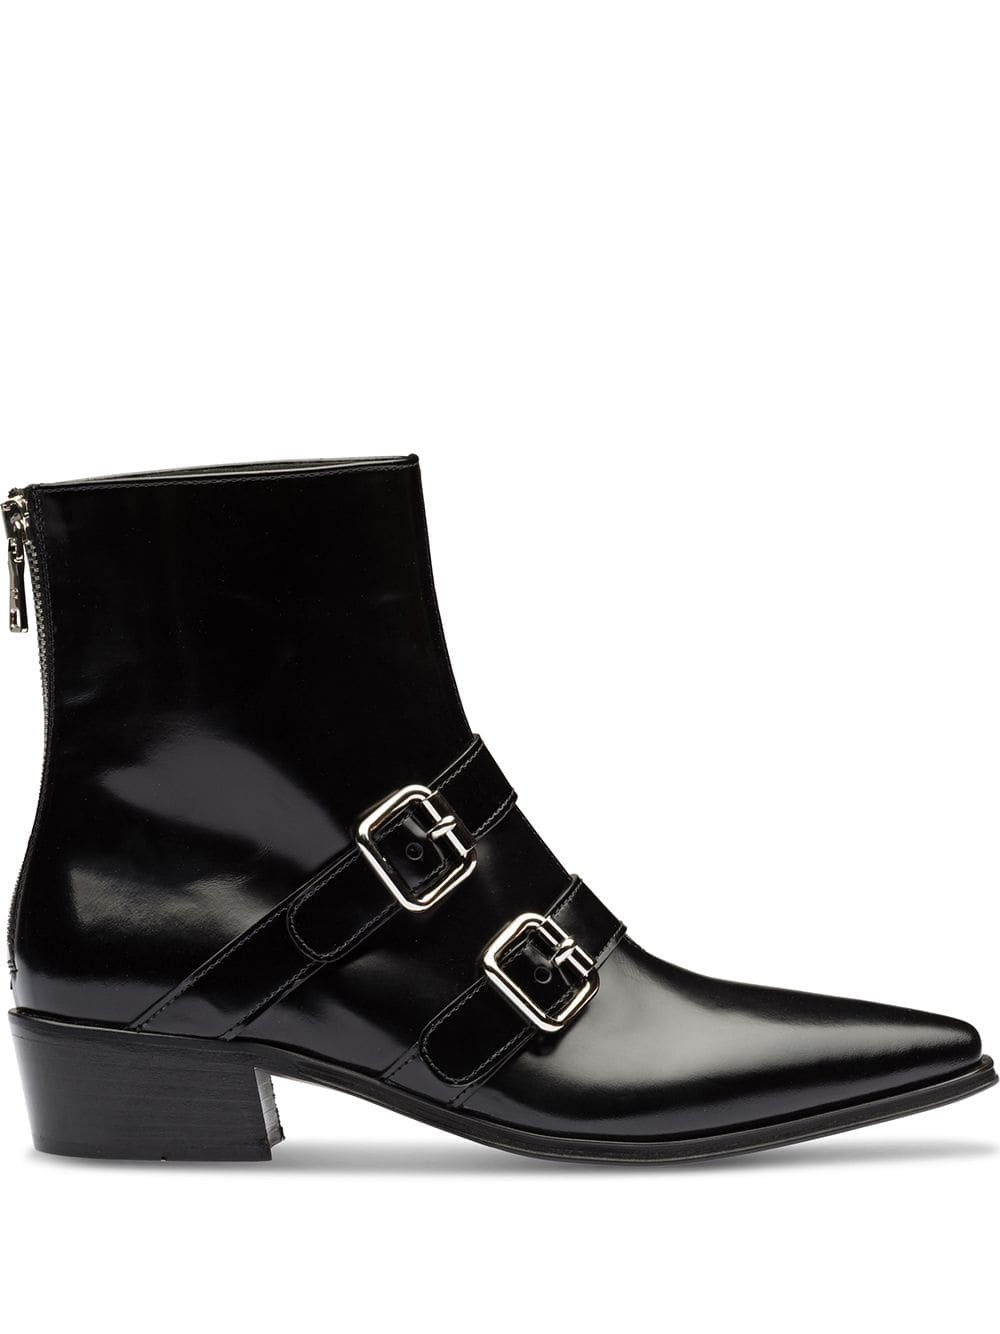 Black Prada Buckled Ankle Boots   Farfetch.com